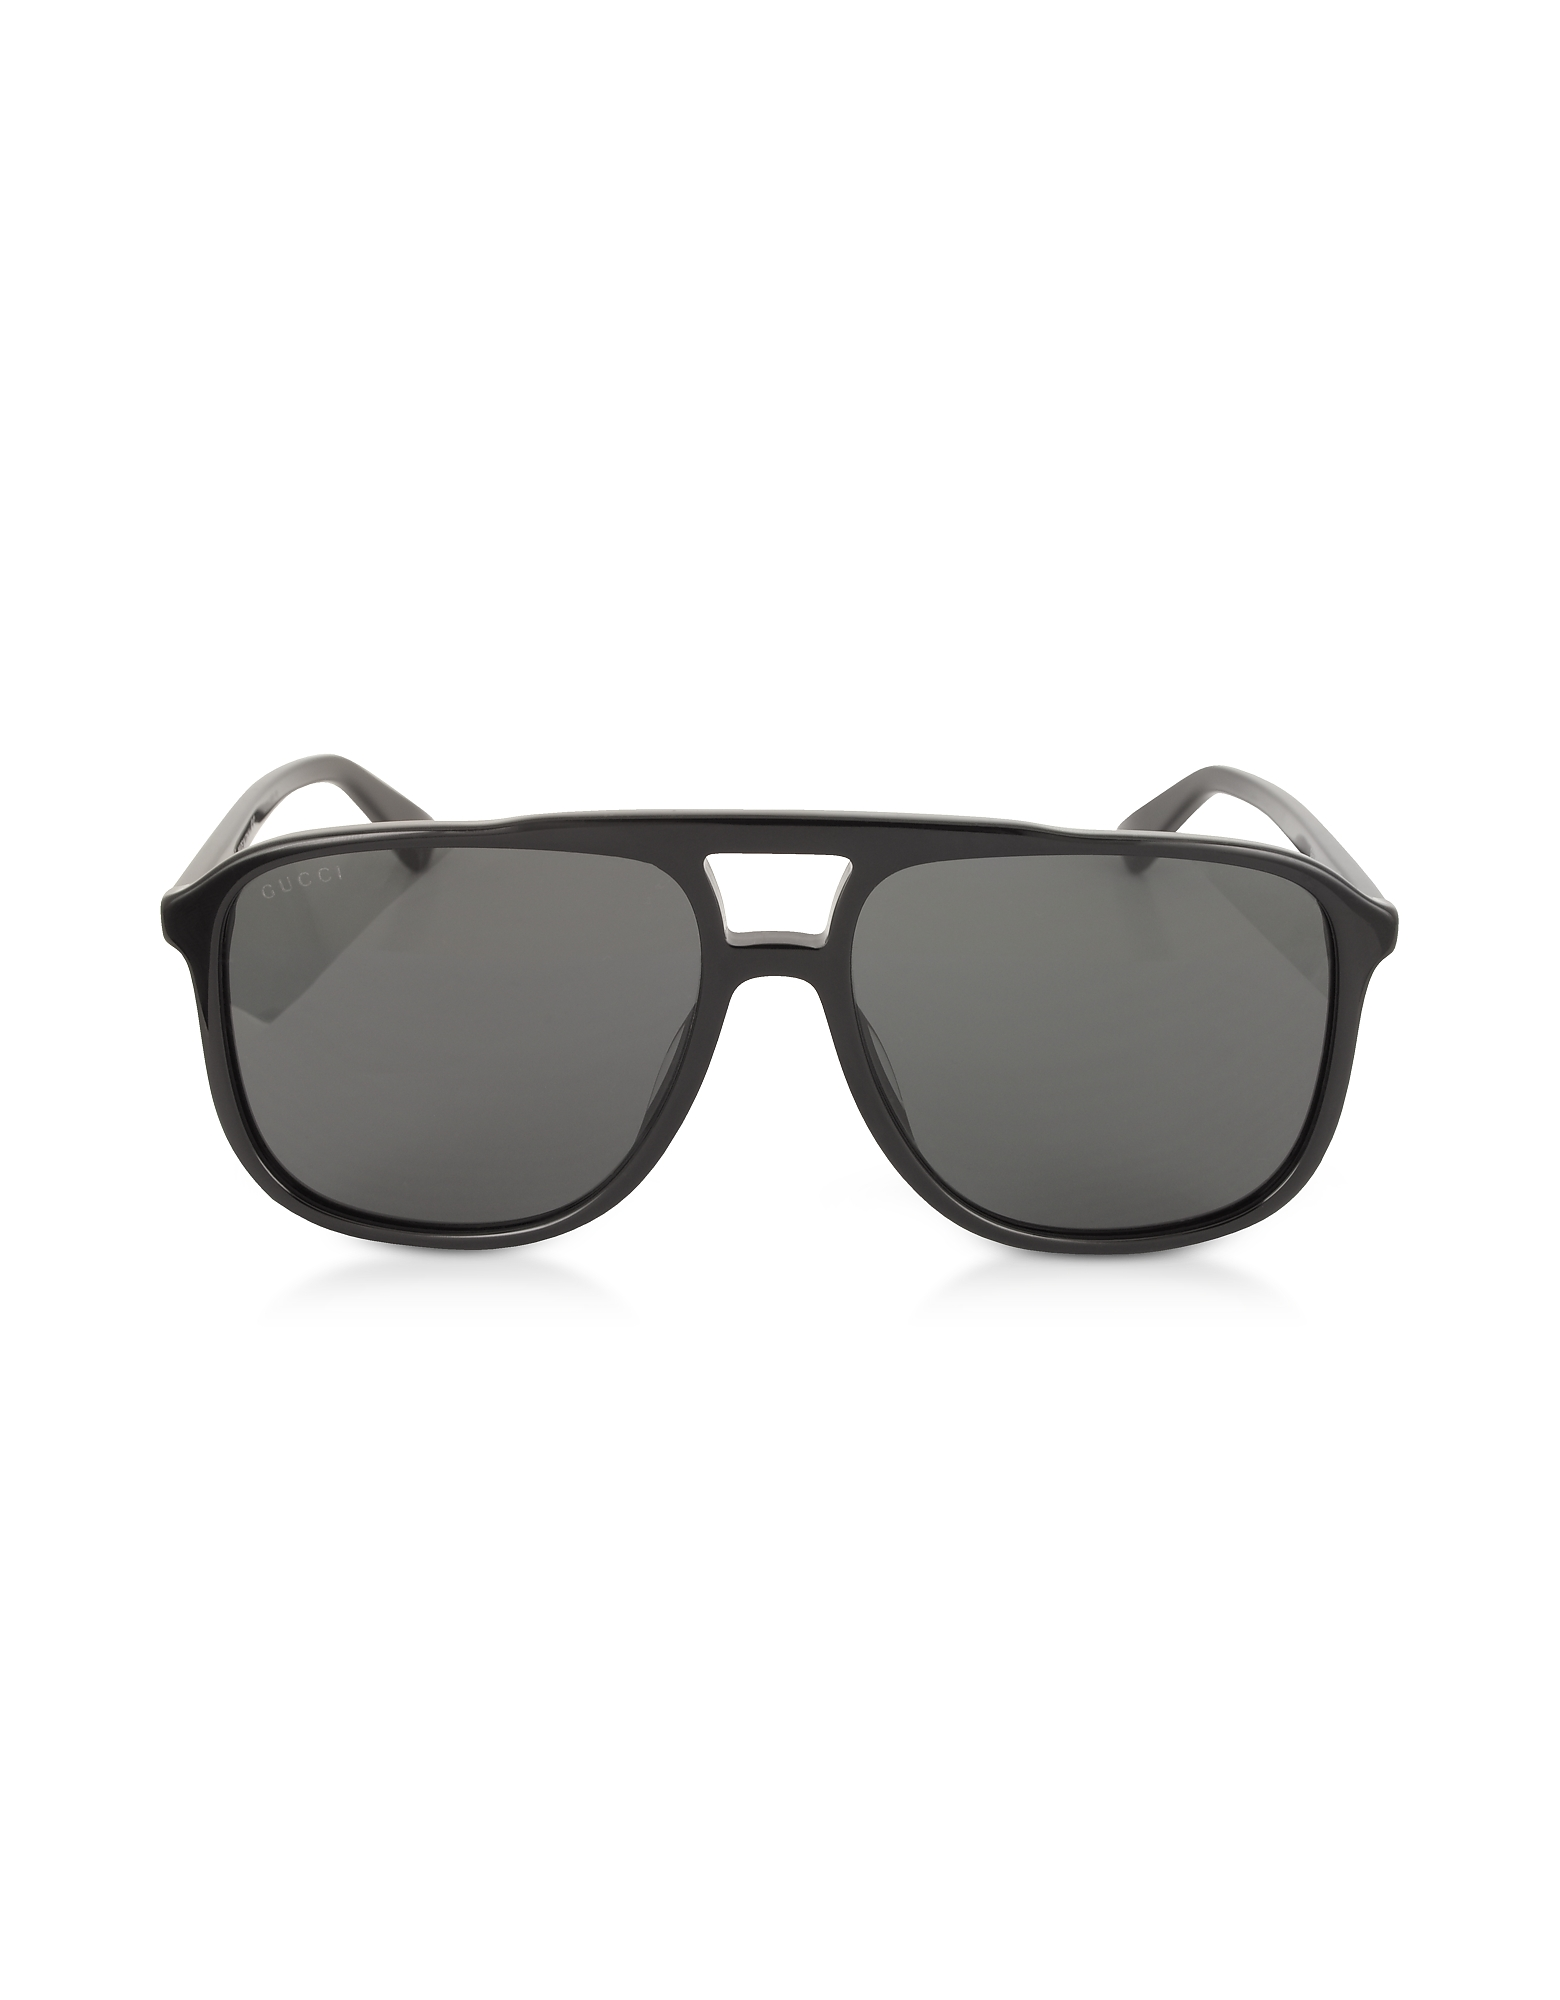 Gucci Designer Sunglasses, GG0262S Rectangular-frame Black Acetate Sunglasses